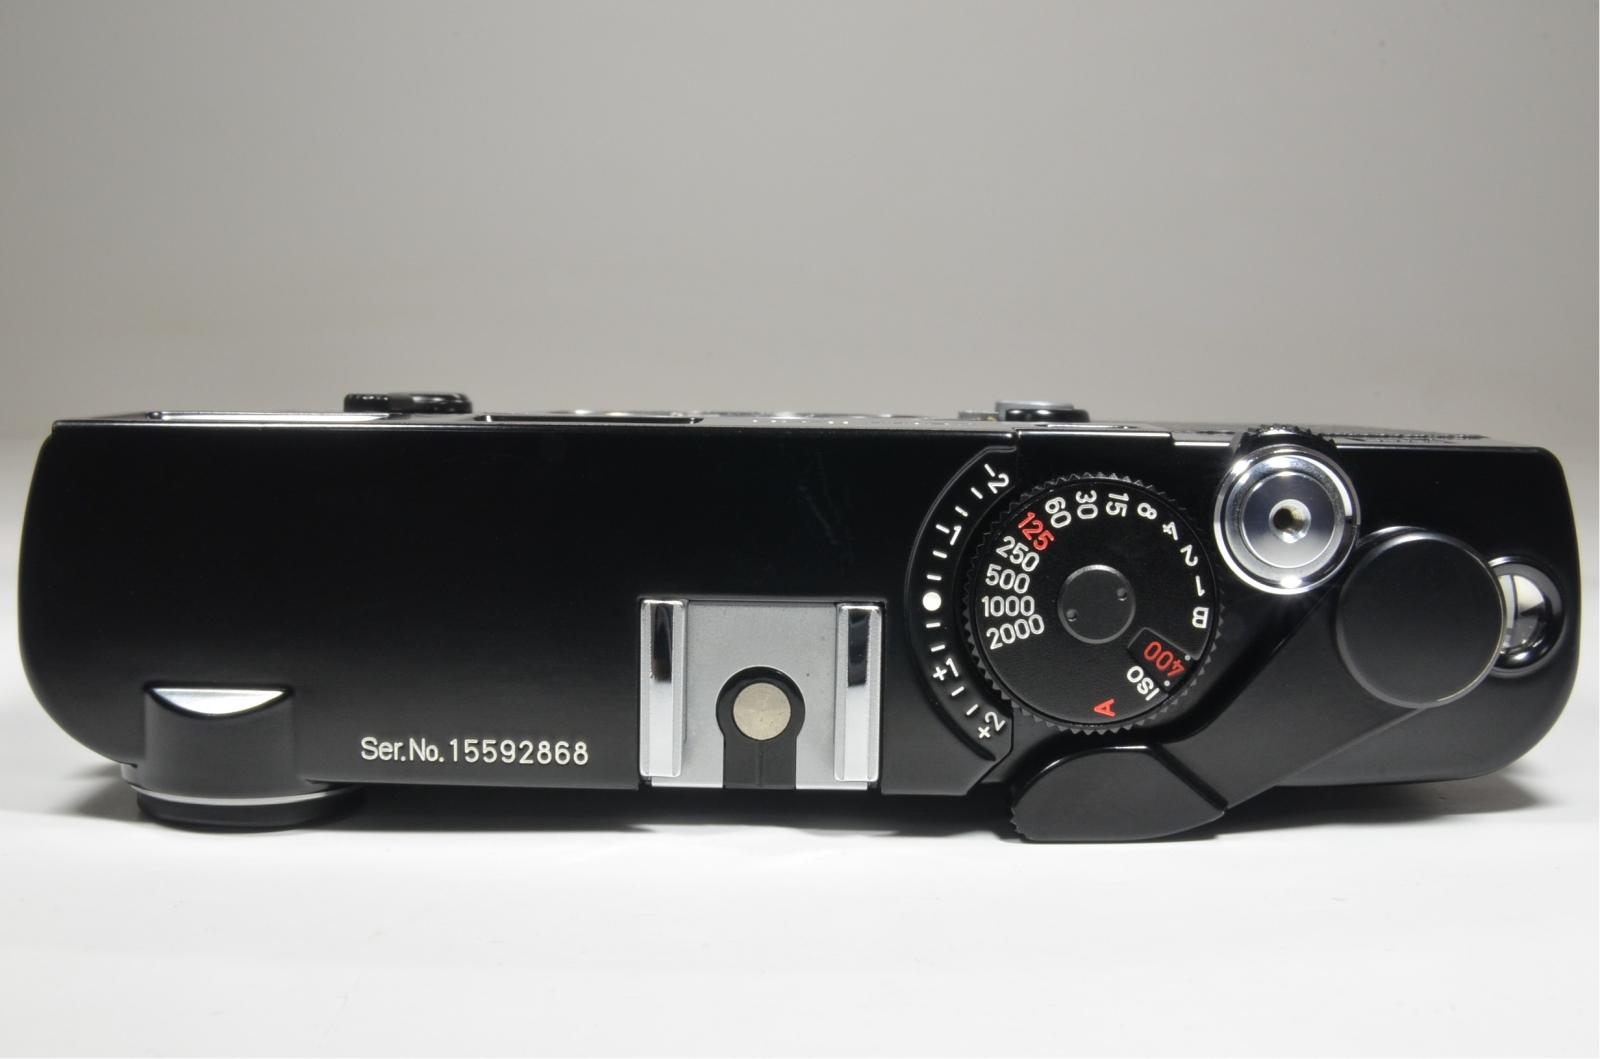 zeiss ikon zm 35mm rangefinder film camera in black with strap